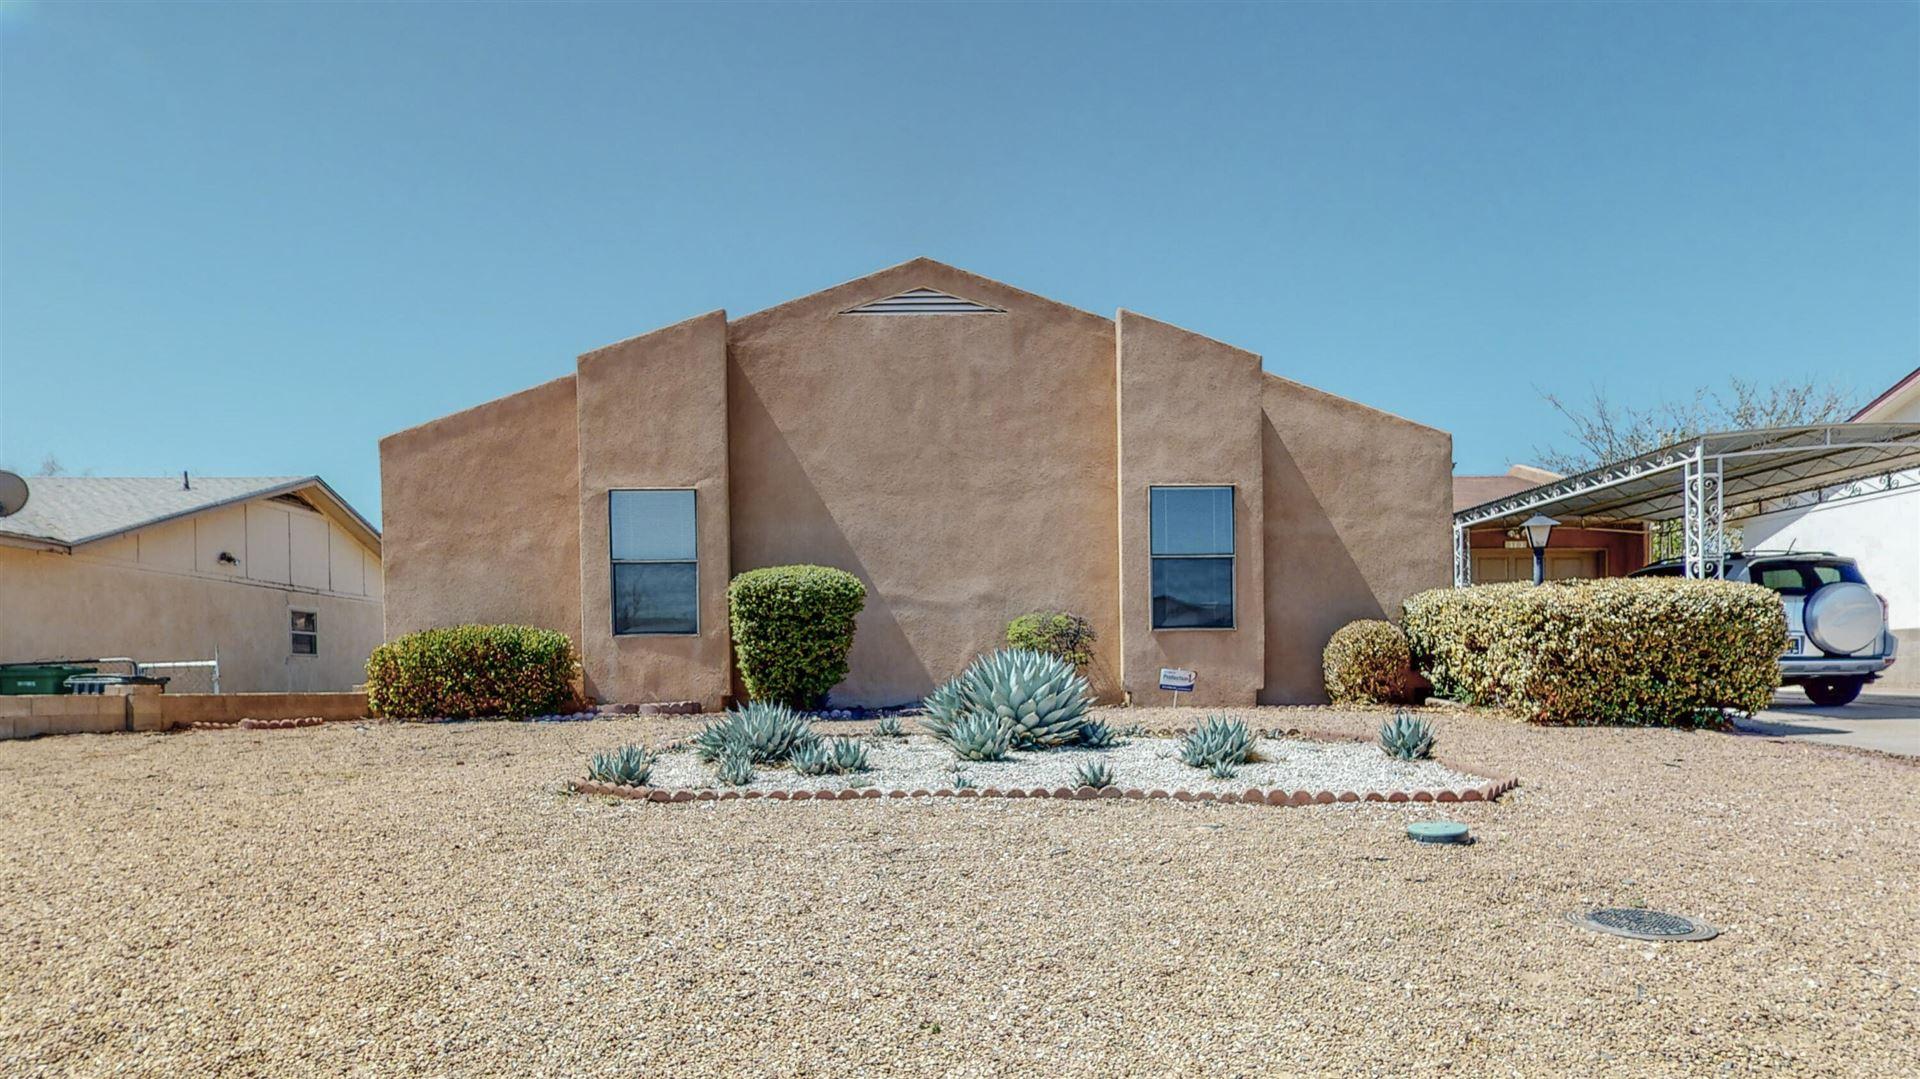 Photo of 313 WESTERN HILLS Drive SE, Rio Rancho, NM 87124 (MLS # 989535)